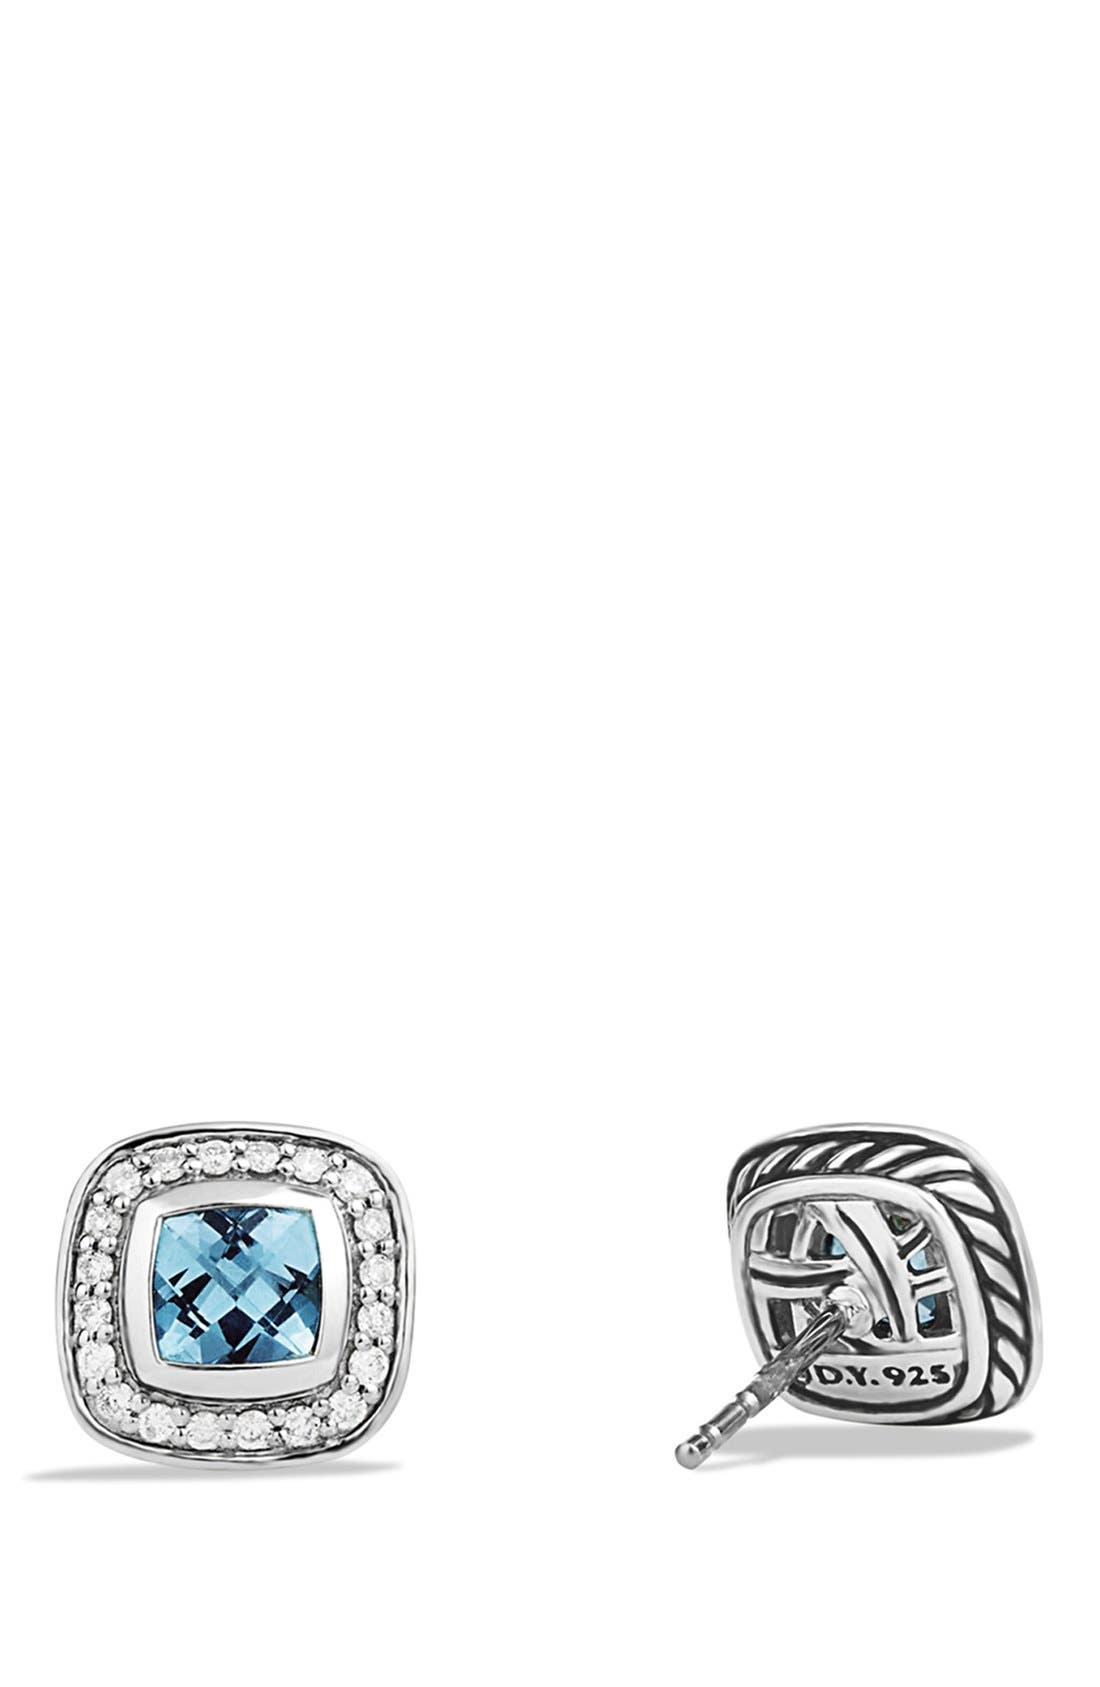 Alternate Image 2  - David Yurman 'Albion' Petite Earrings with Diamonds